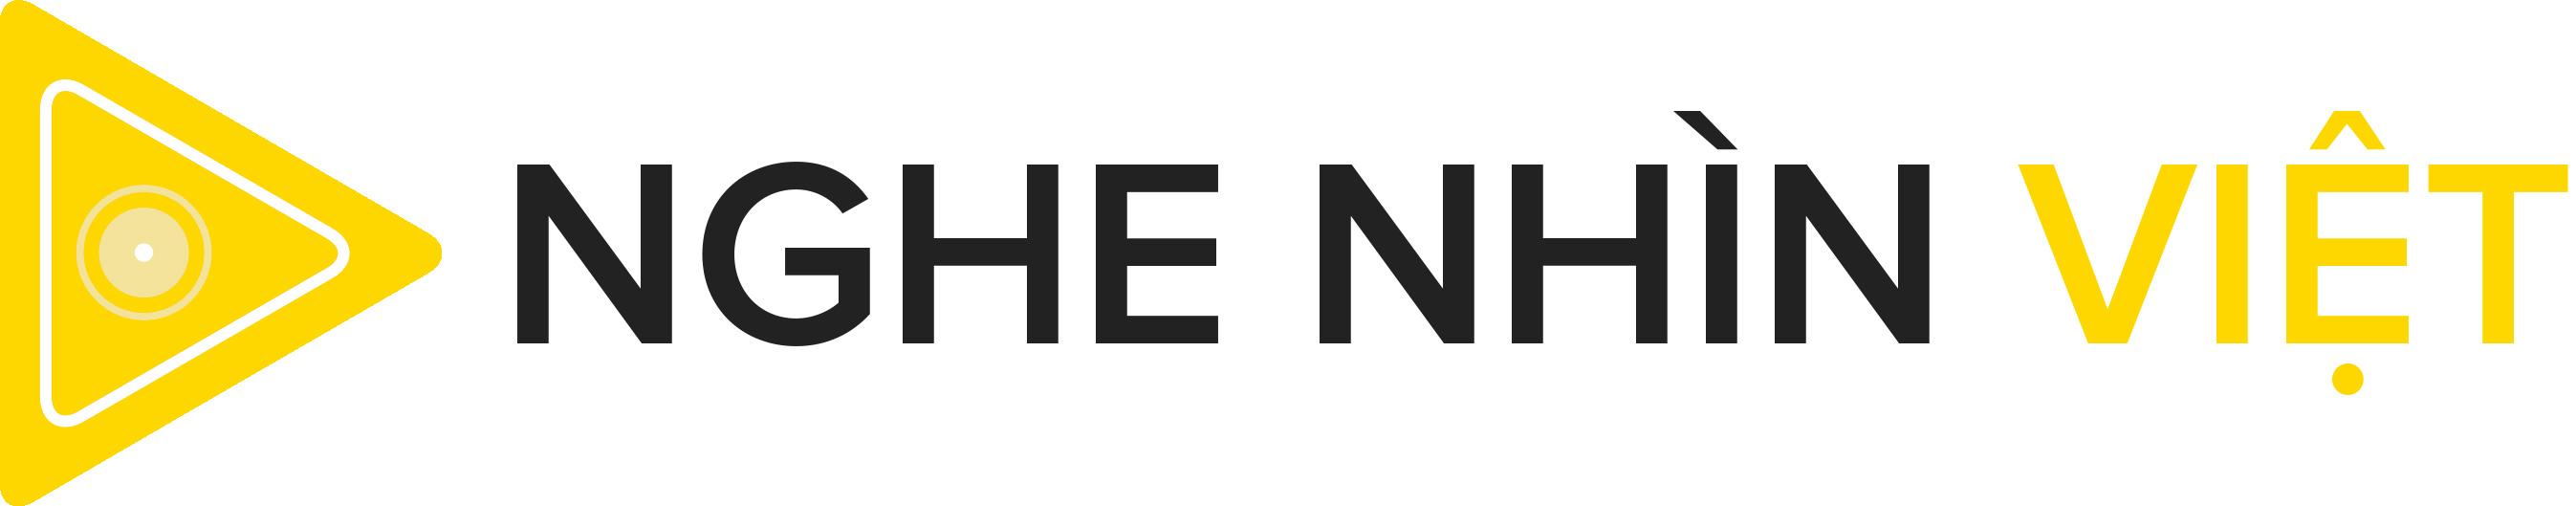 Logo Nghe Nhin Viet